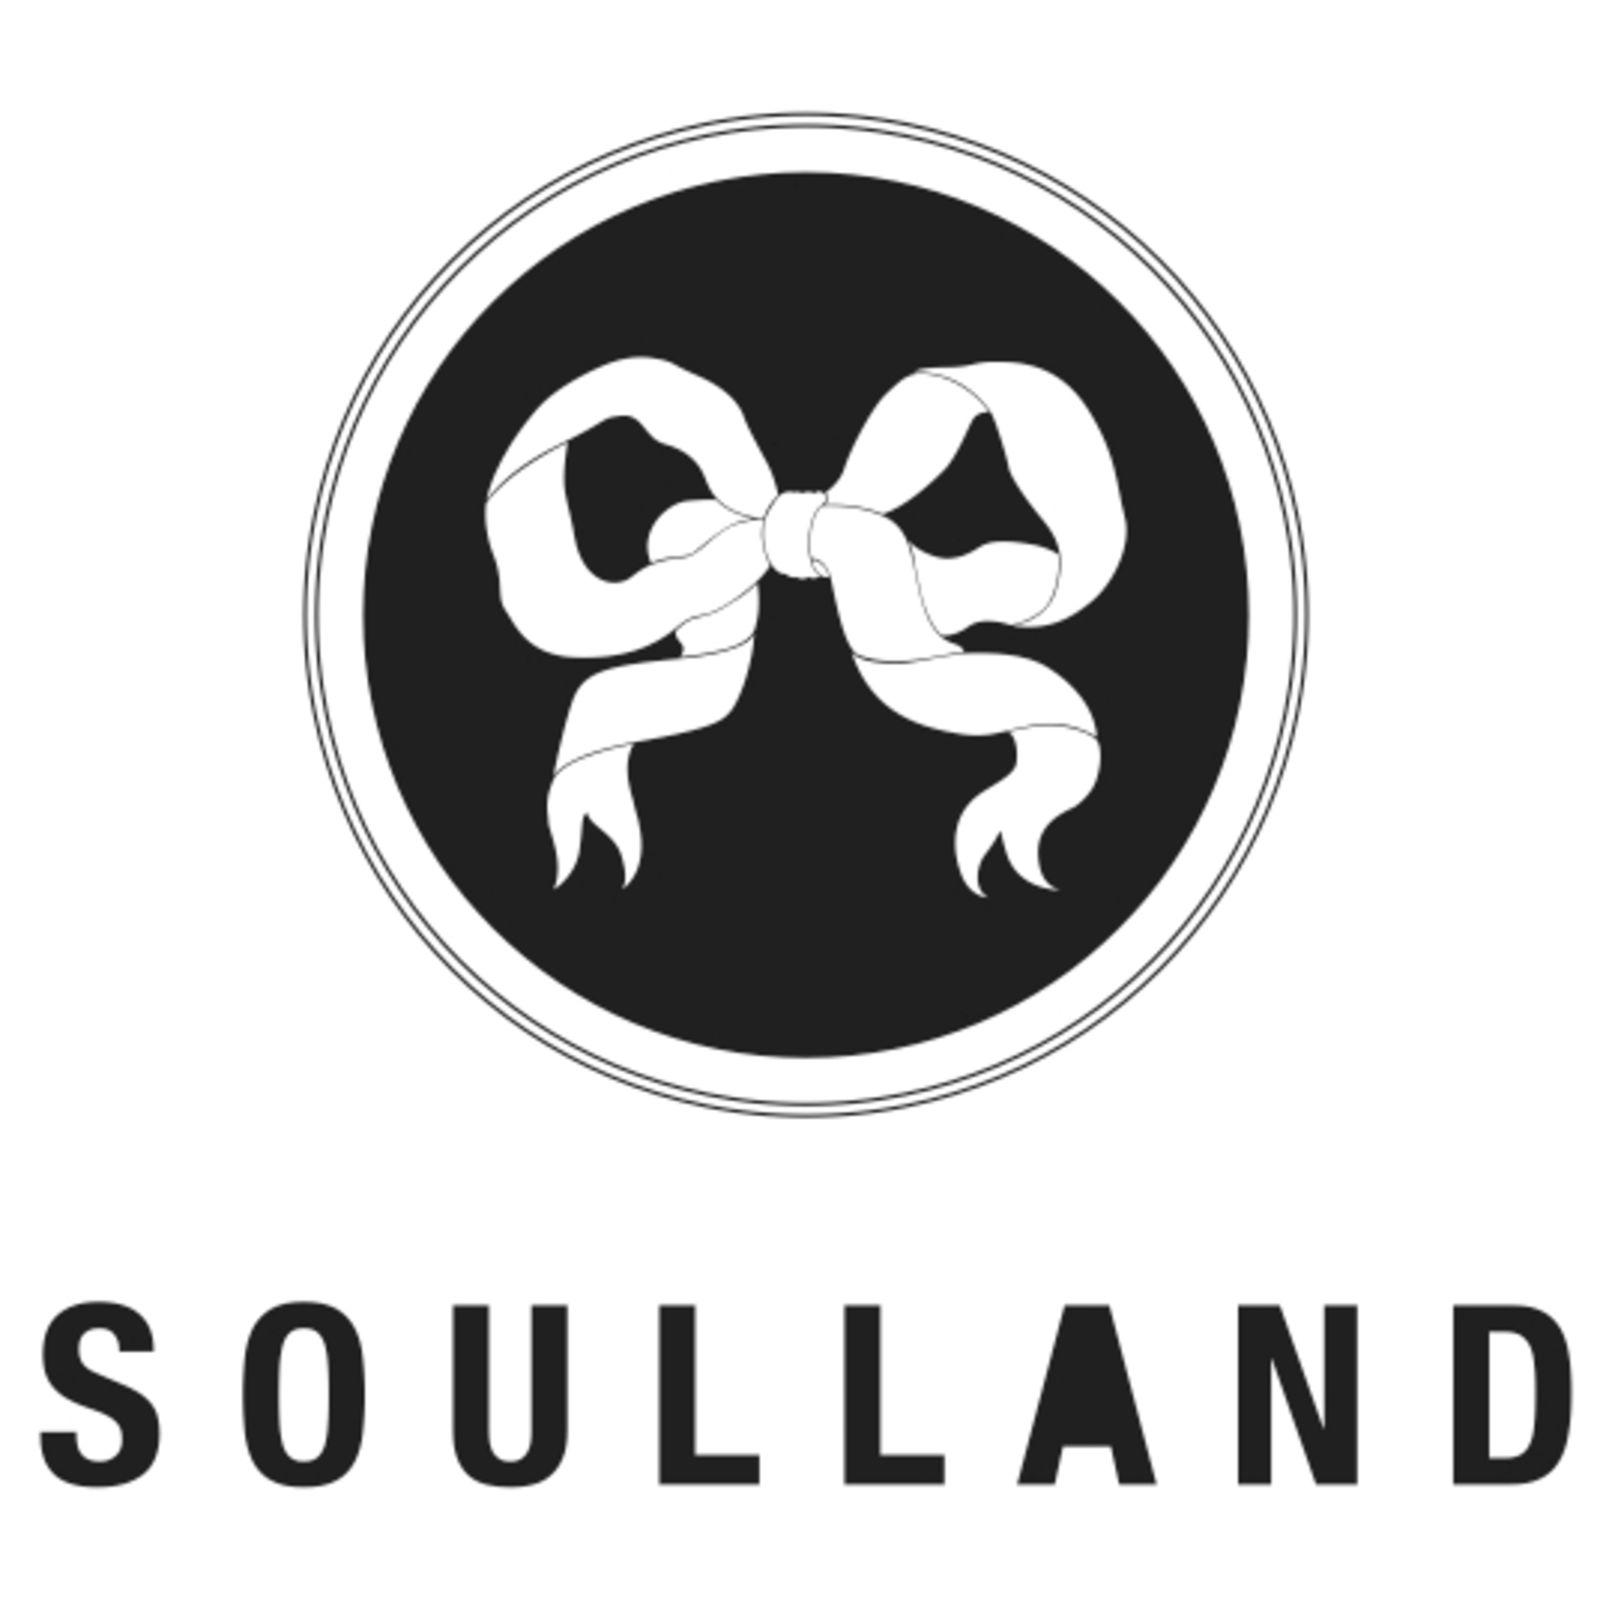 SOULLAND (Bild 1)